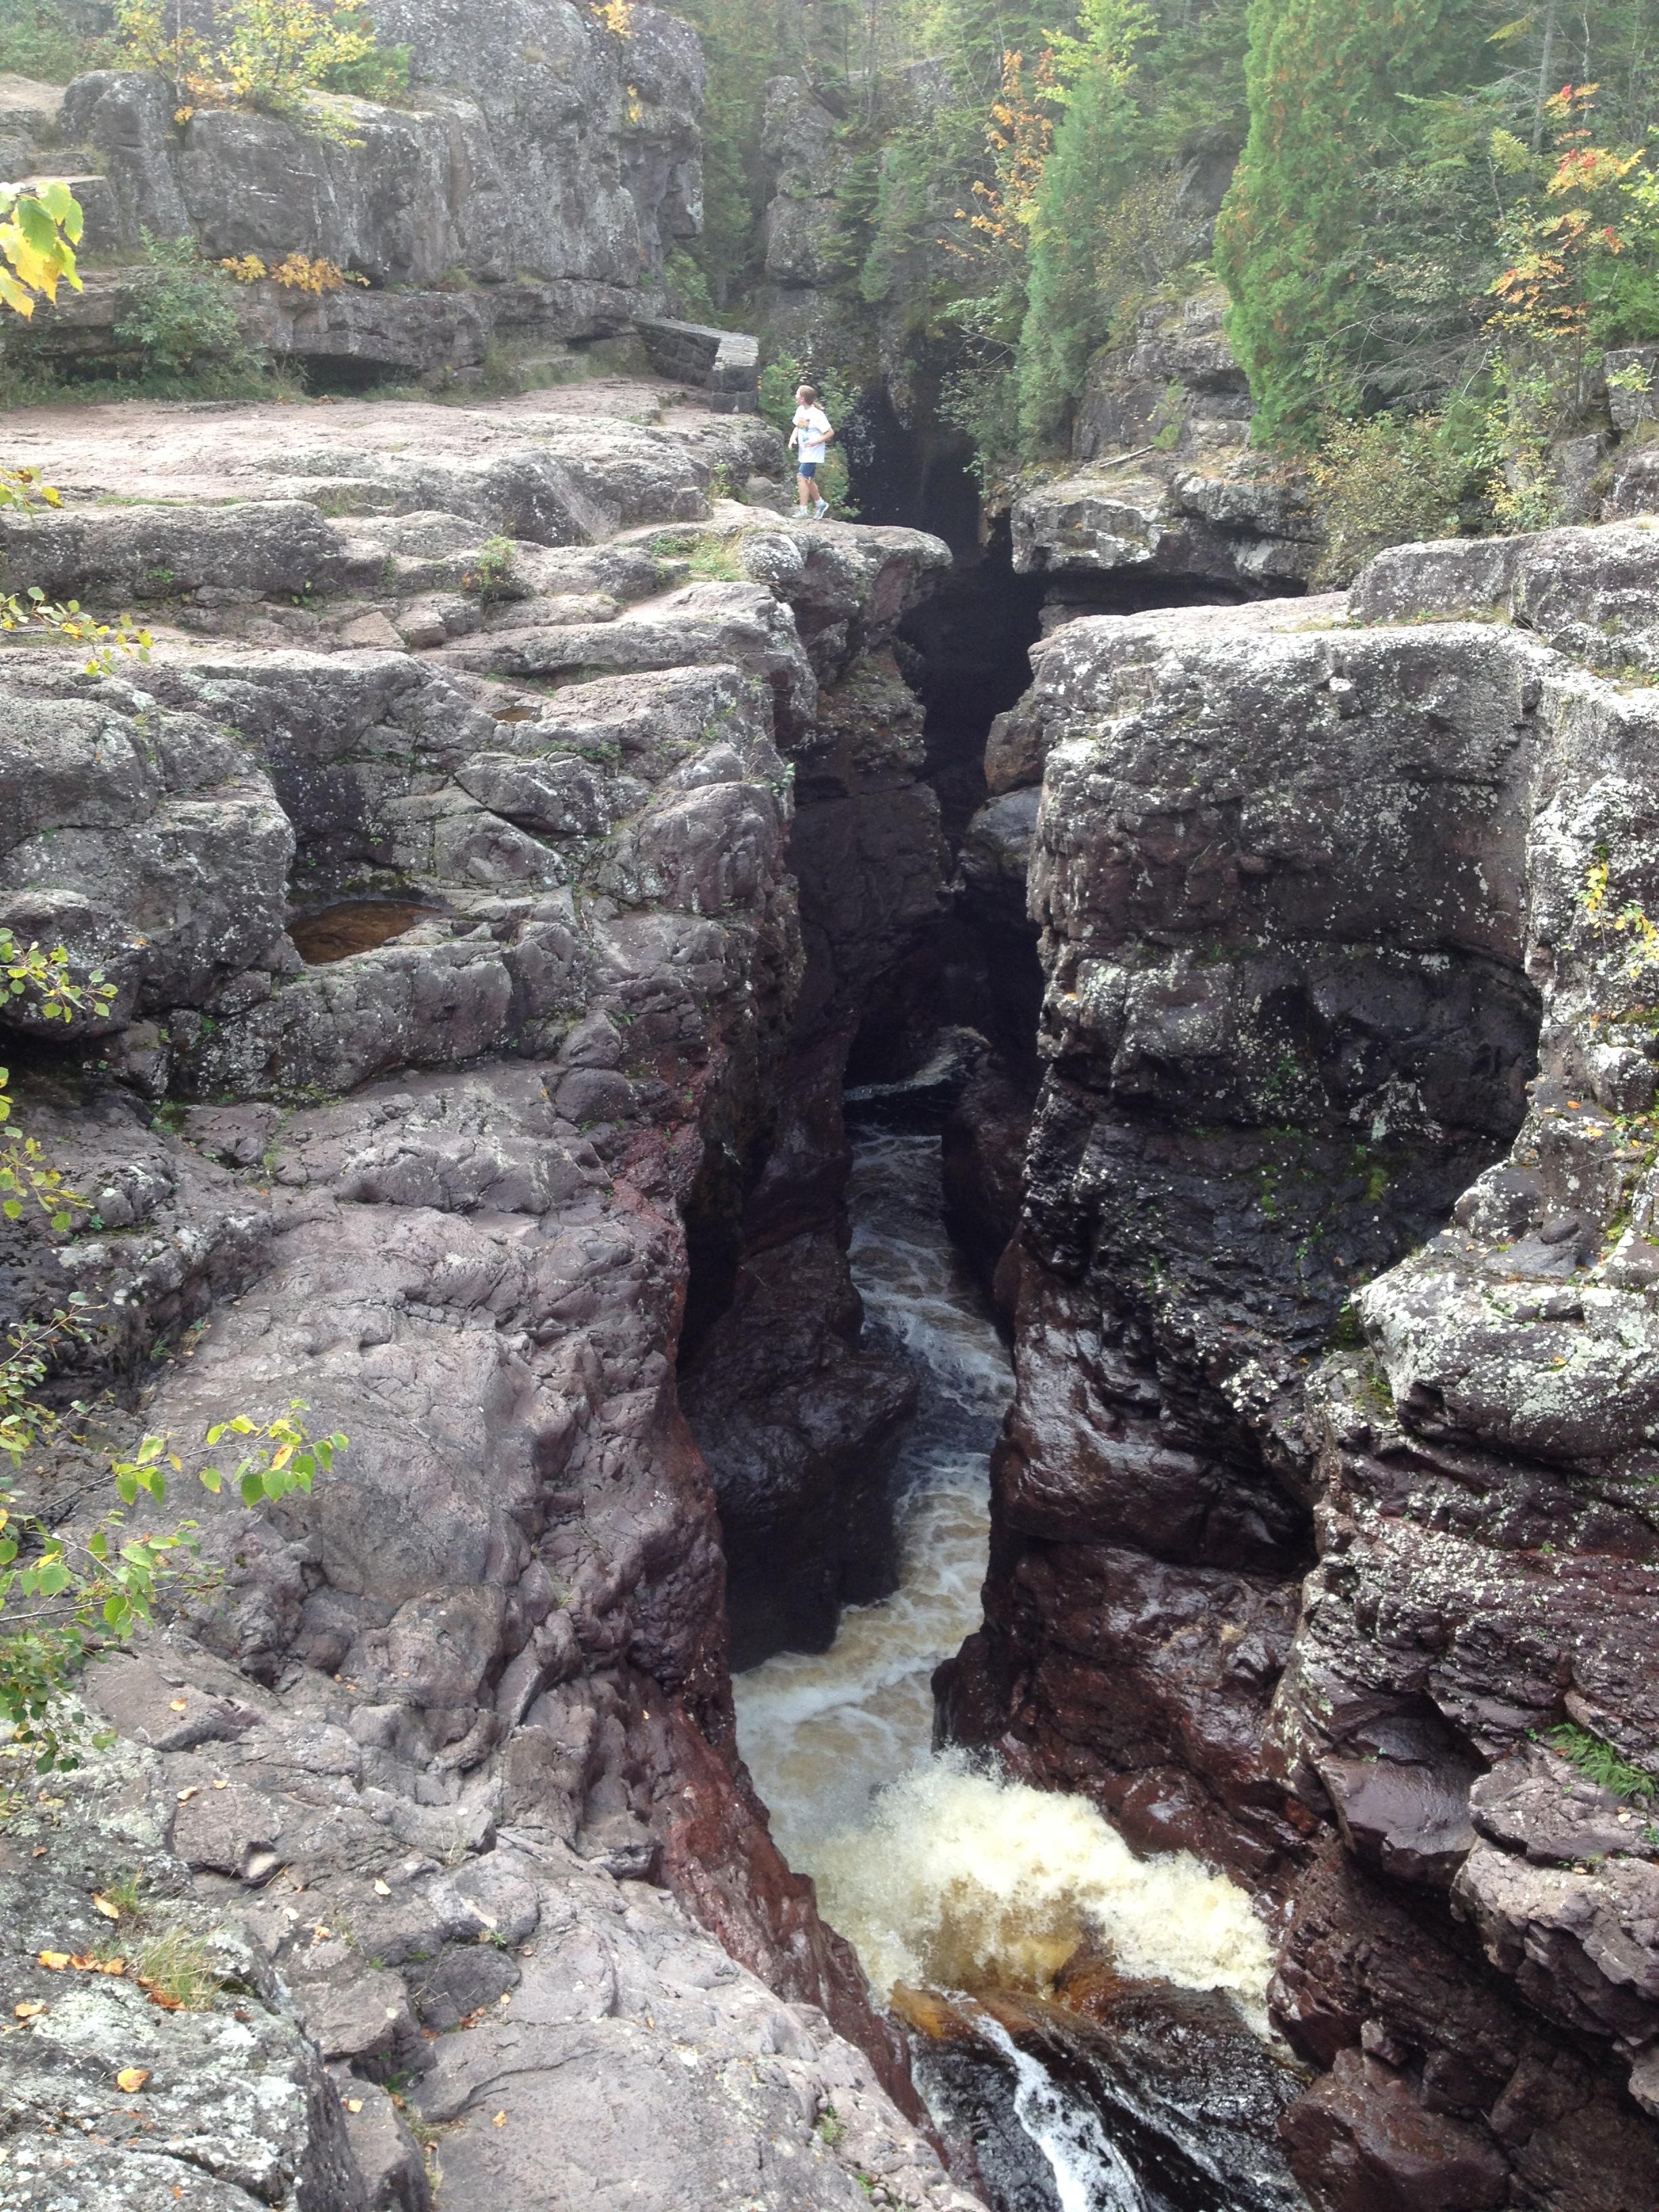 Waterfalls at Temperance River State Park